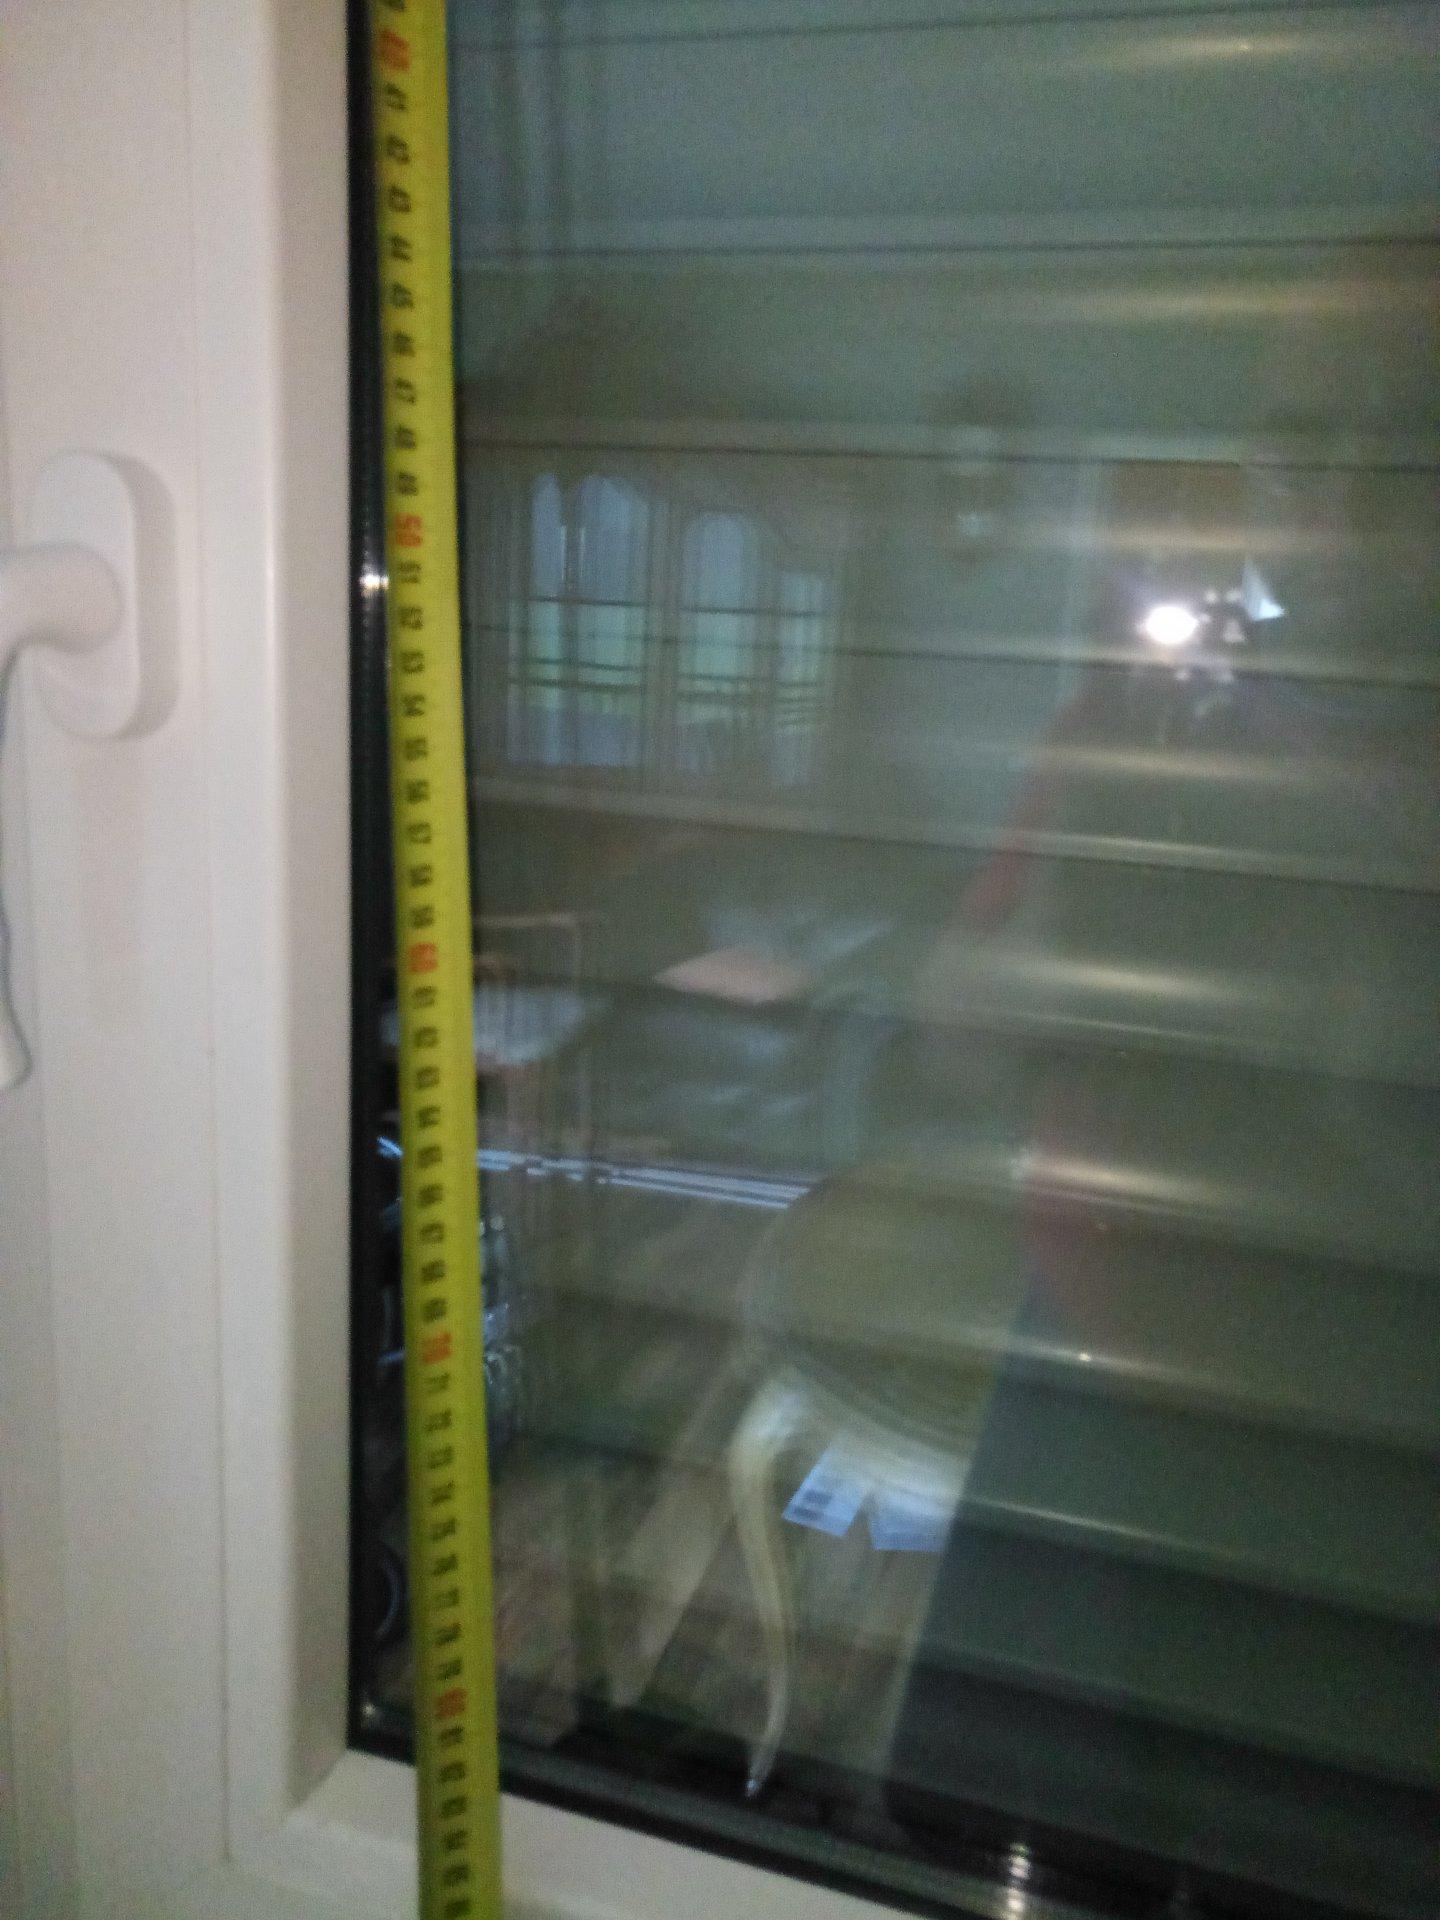 Häufig Fensterbank unter Fenster? LG77